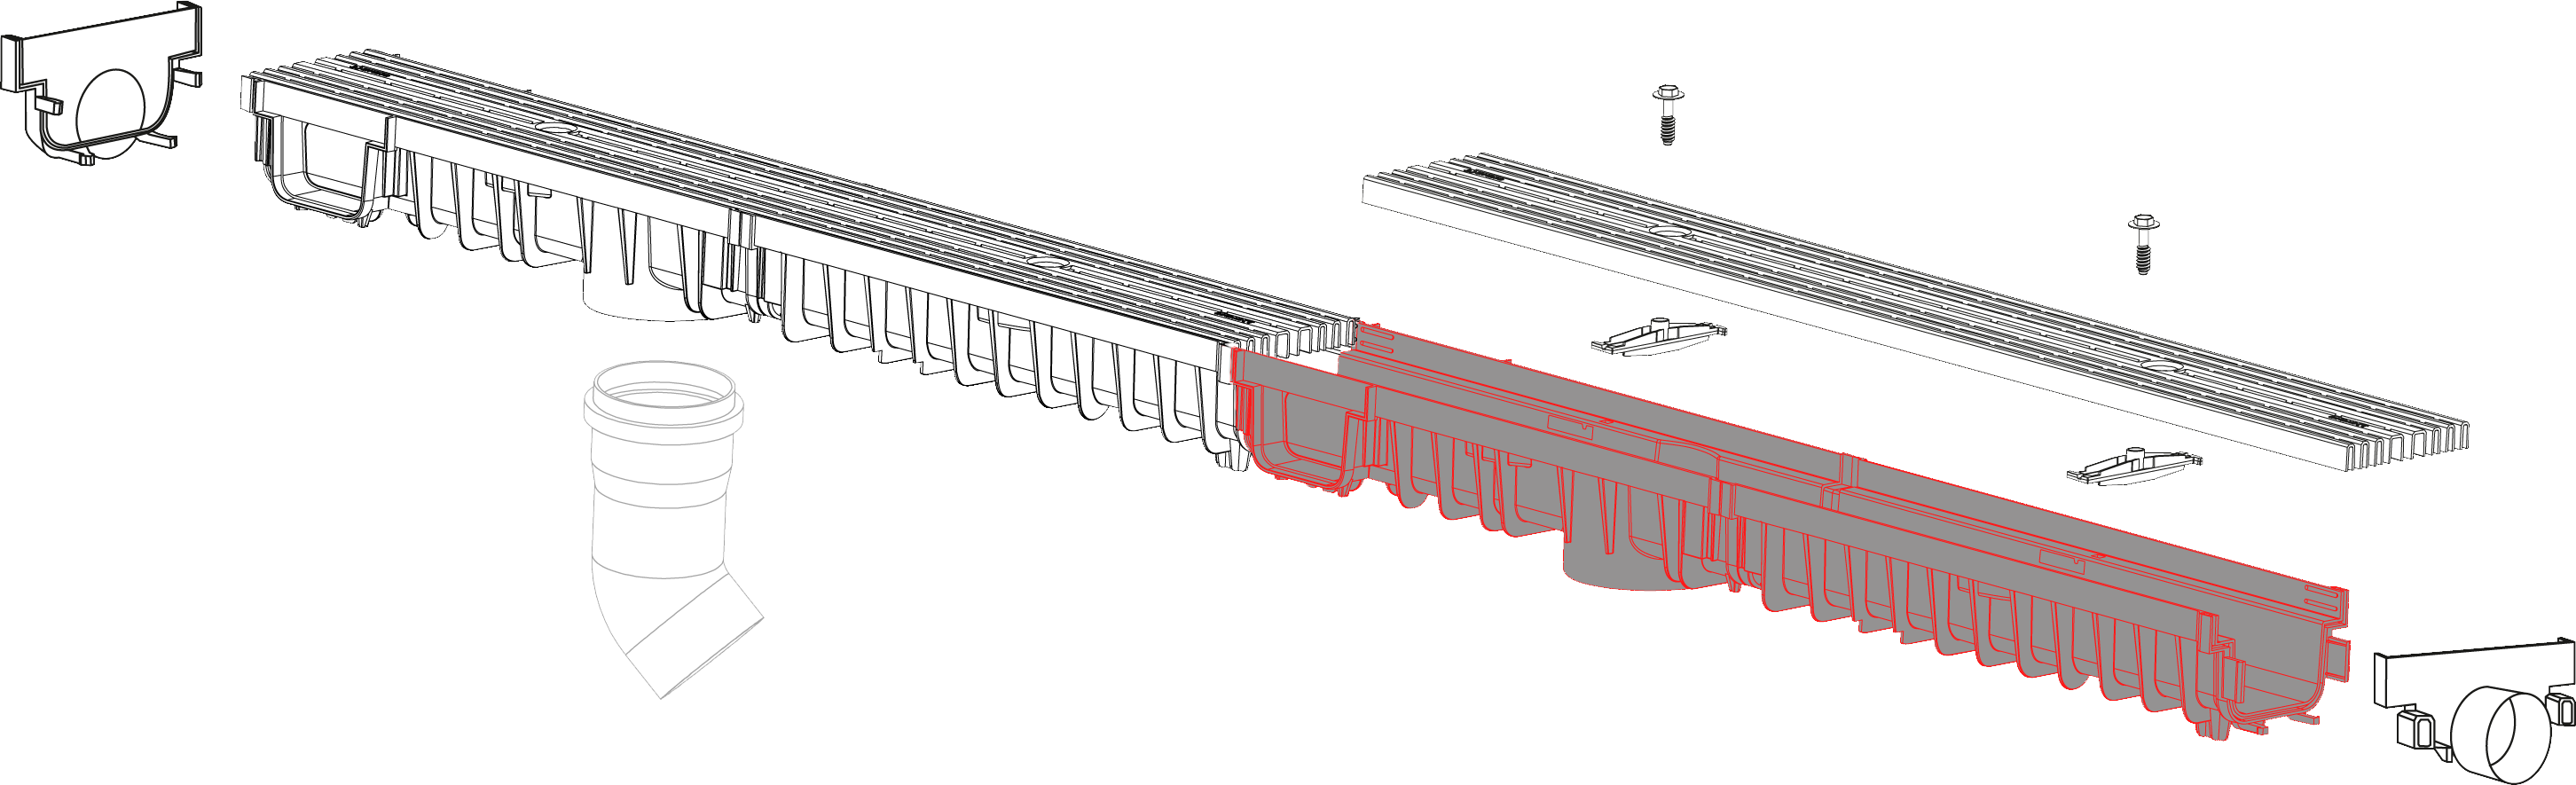 System 1000x70 kanal